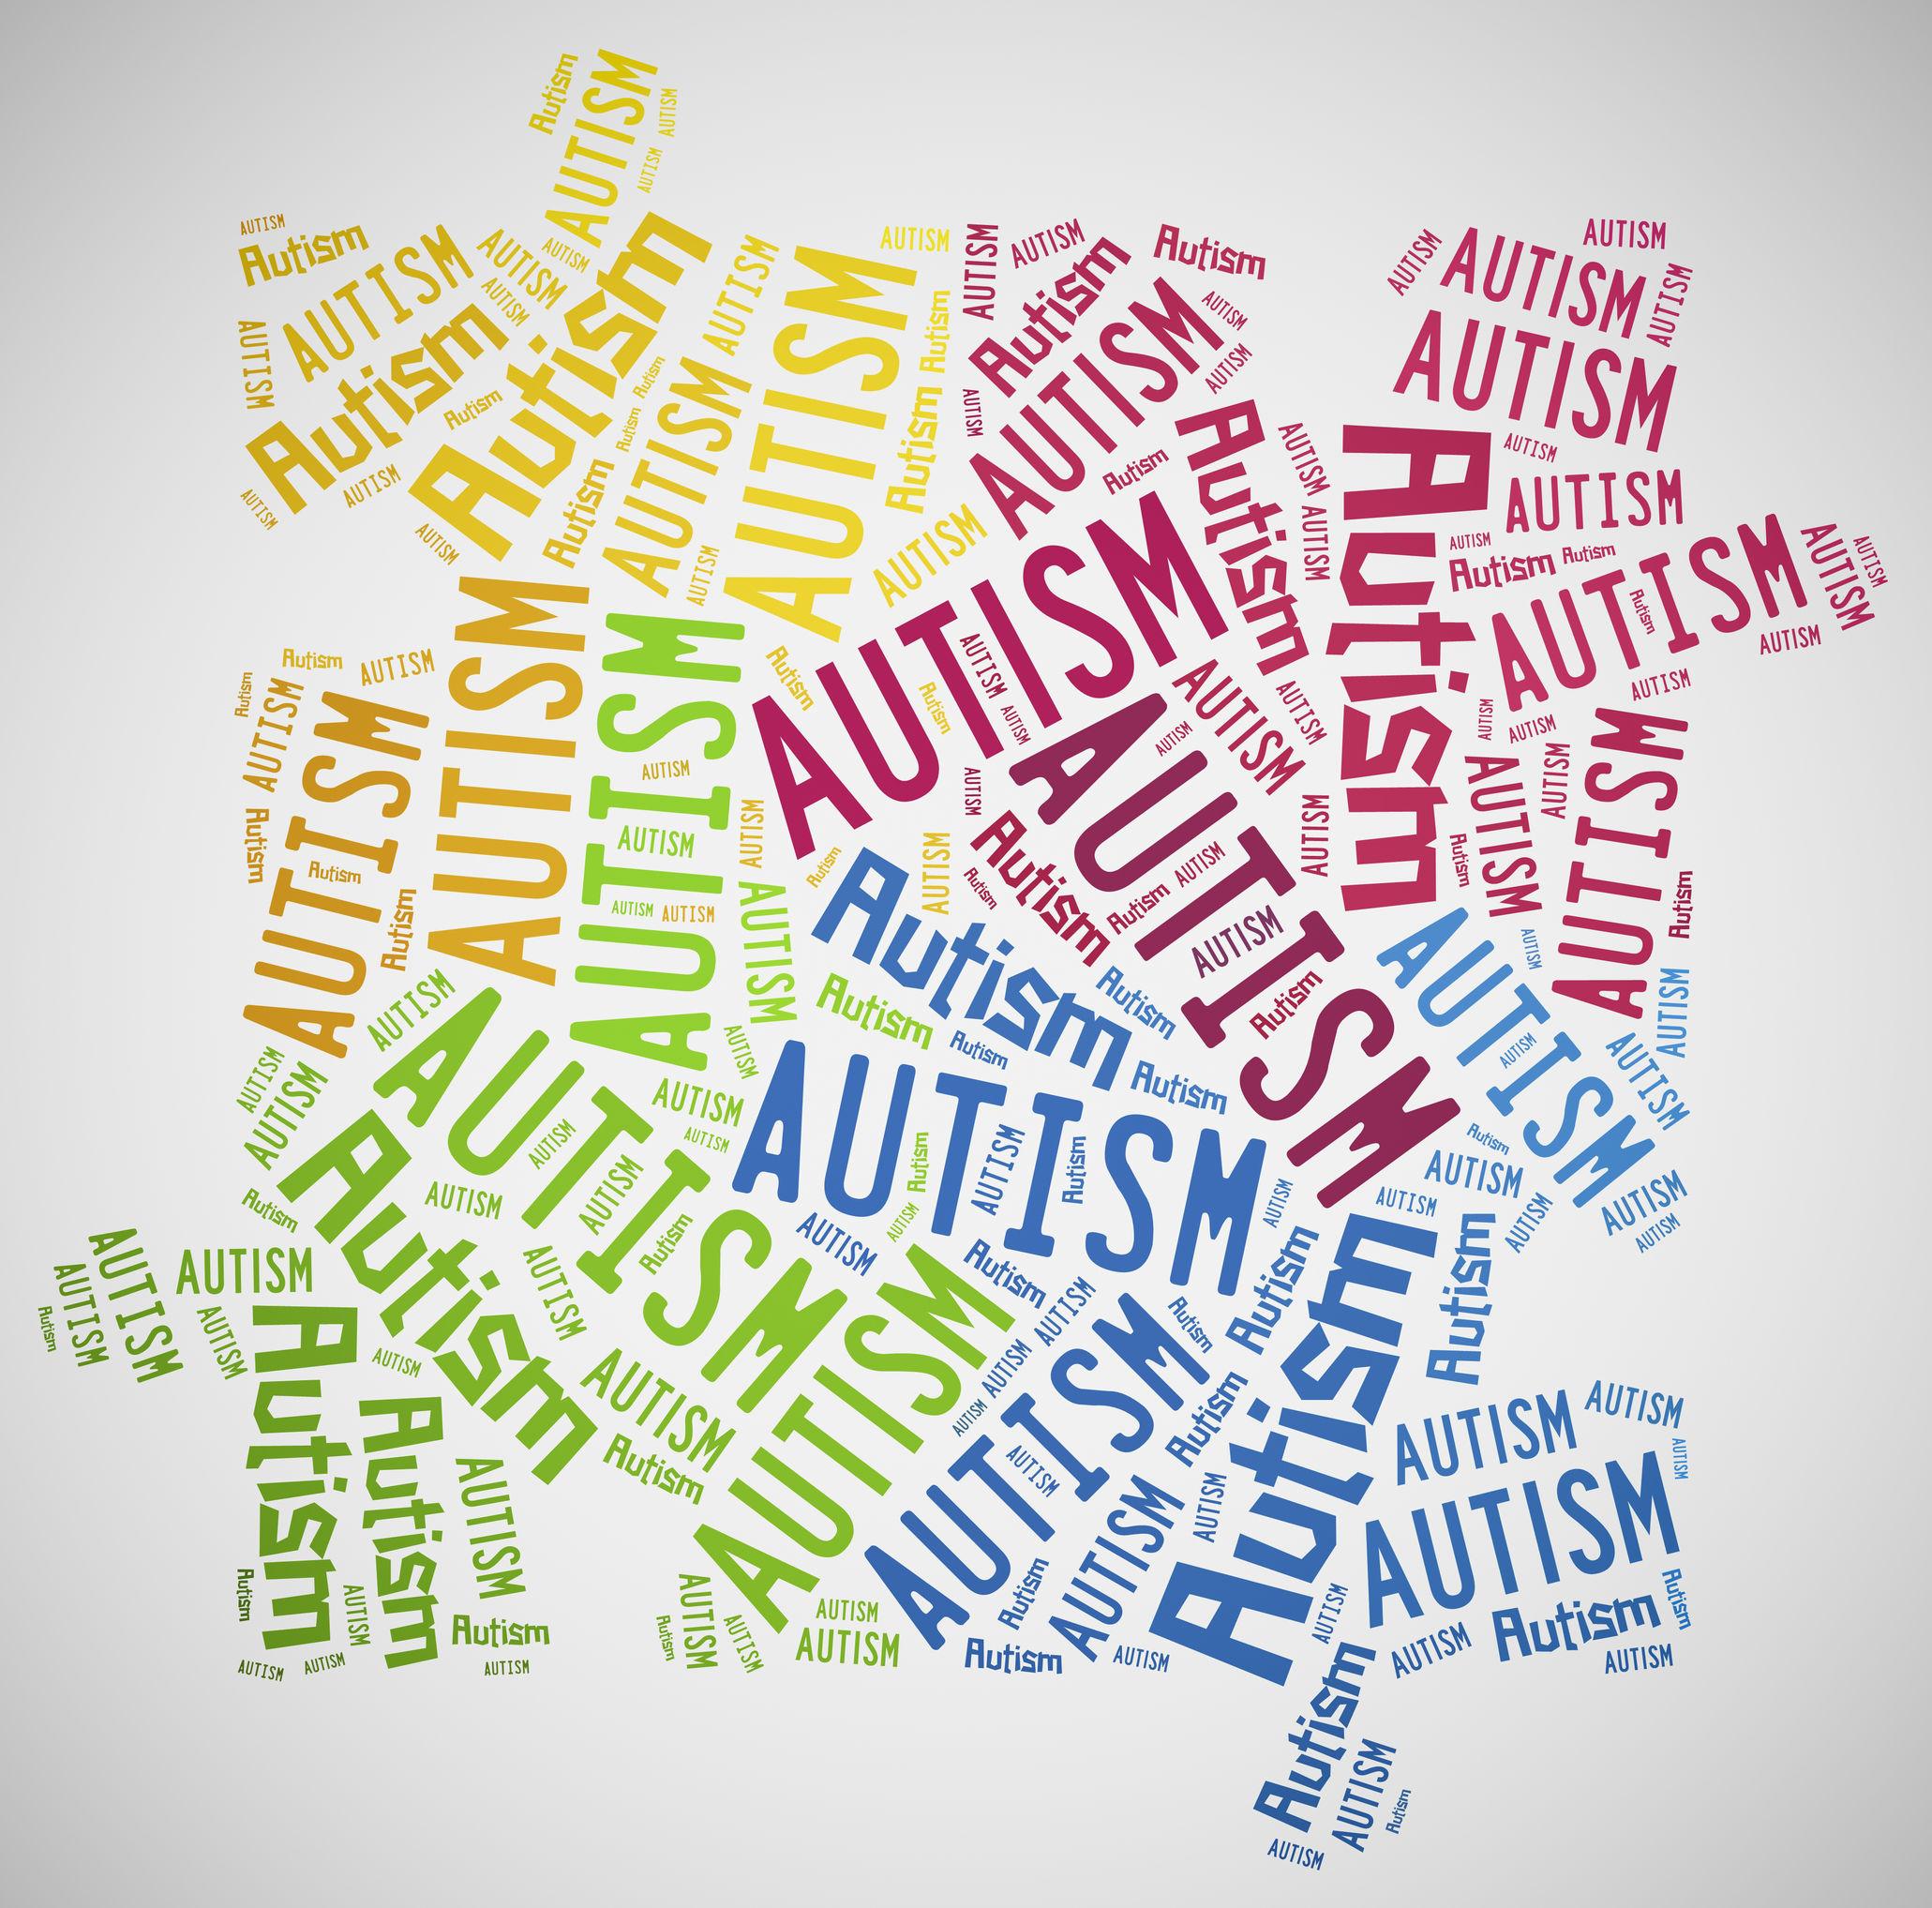 Autism Spectrum Disorder Treatment in Children & Adolescents